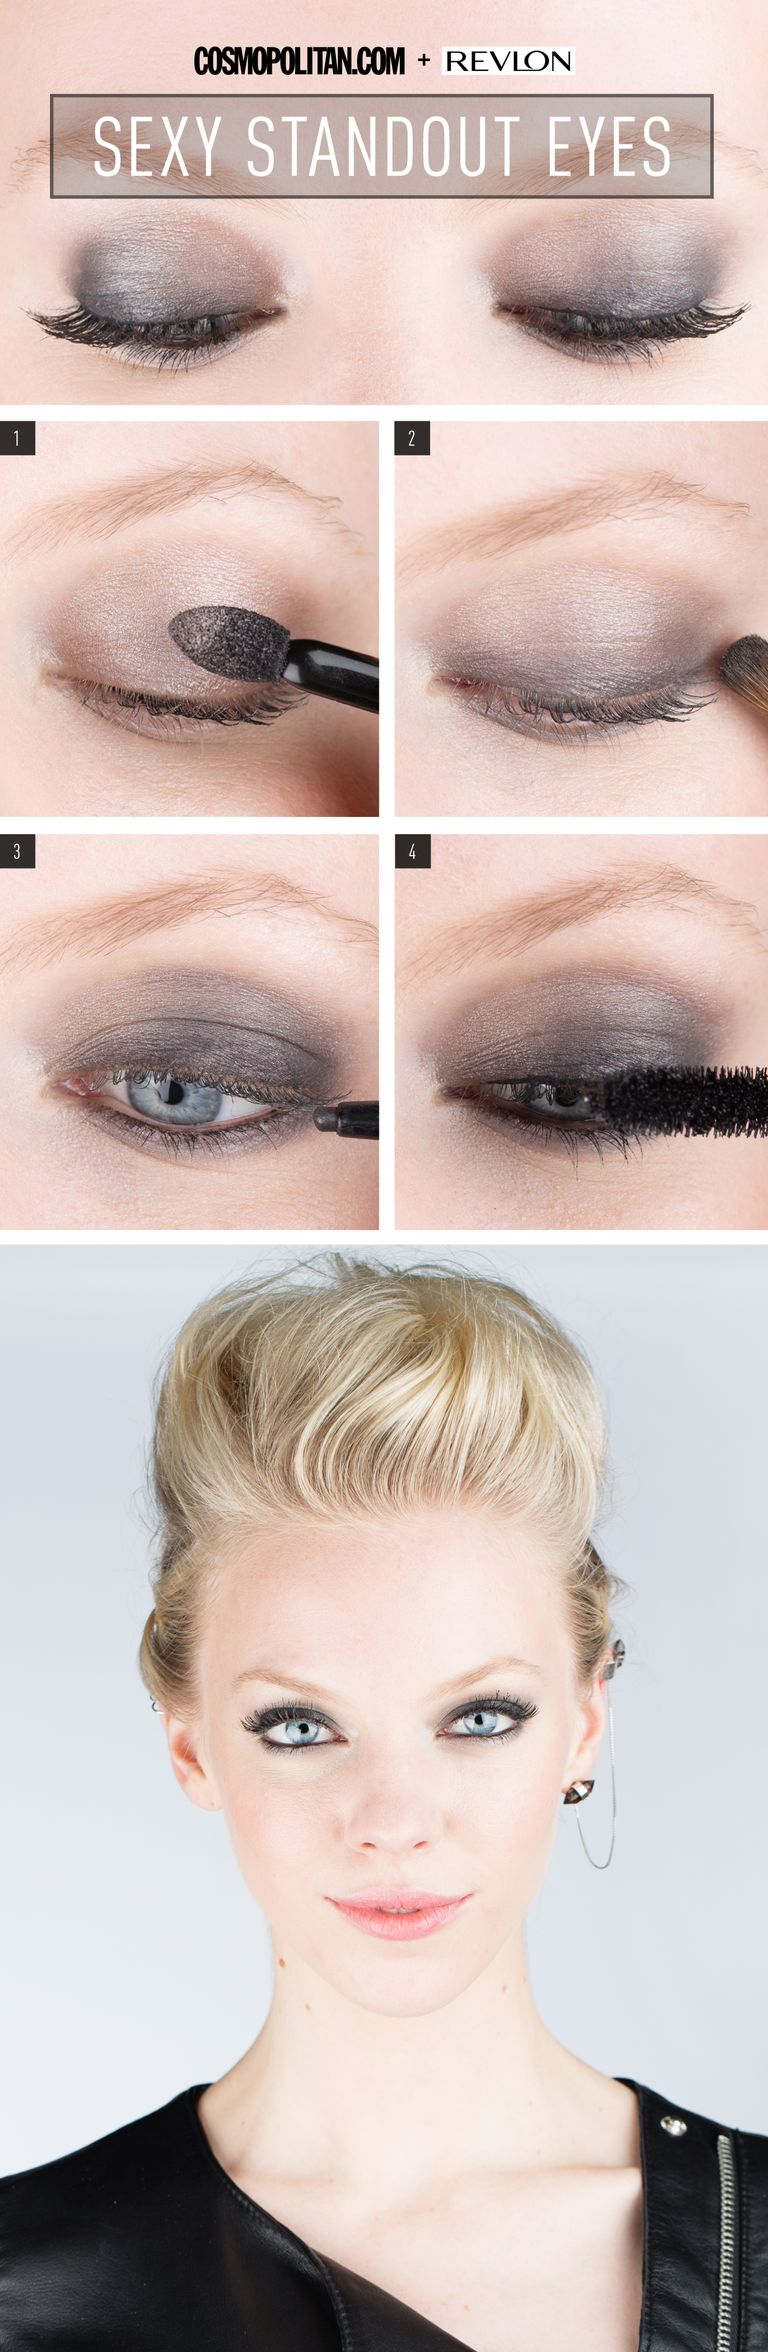 sexy-standout-eye-tutorial-